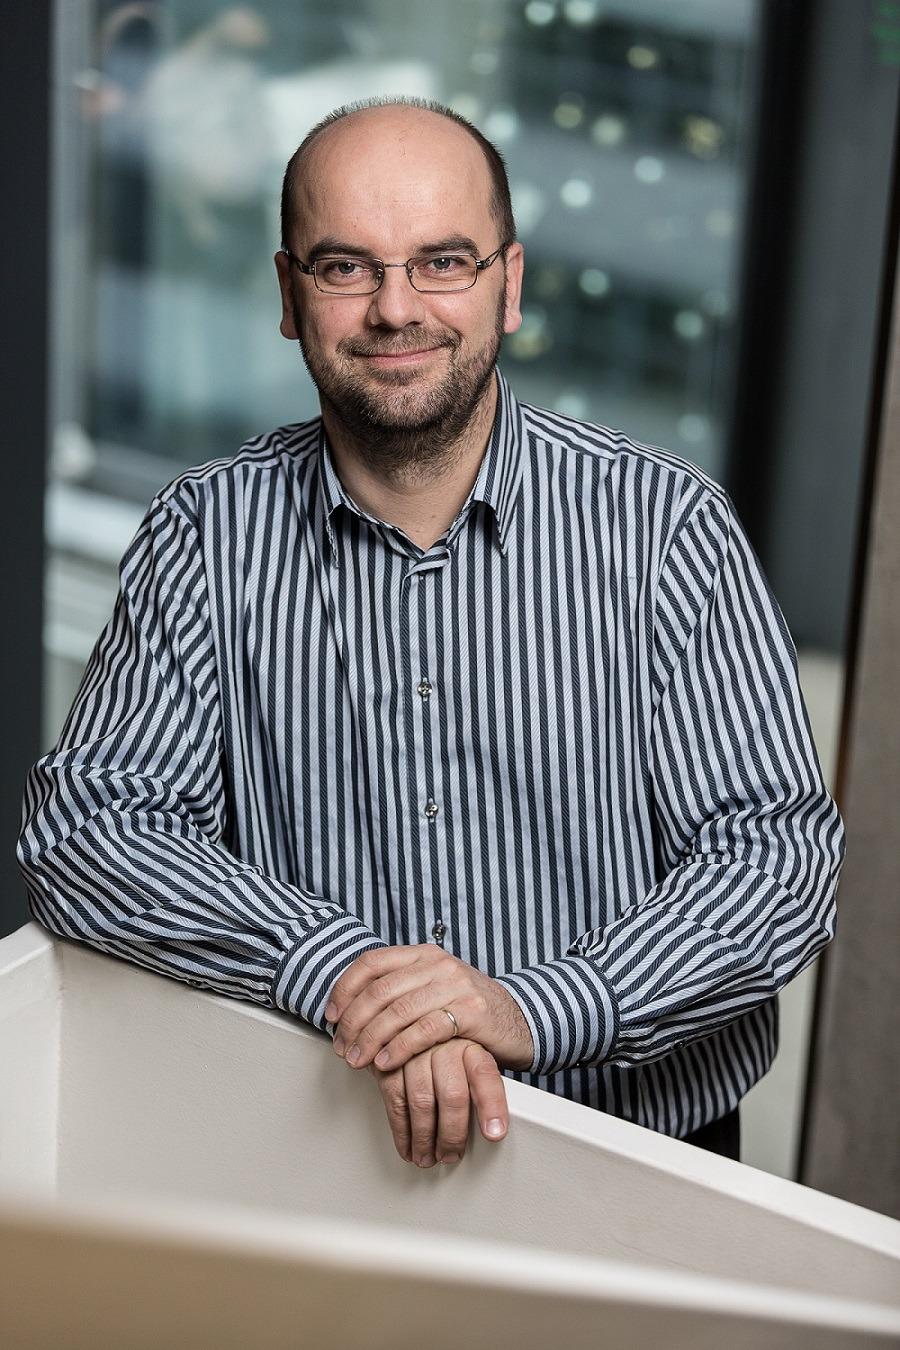 Michal Heisig